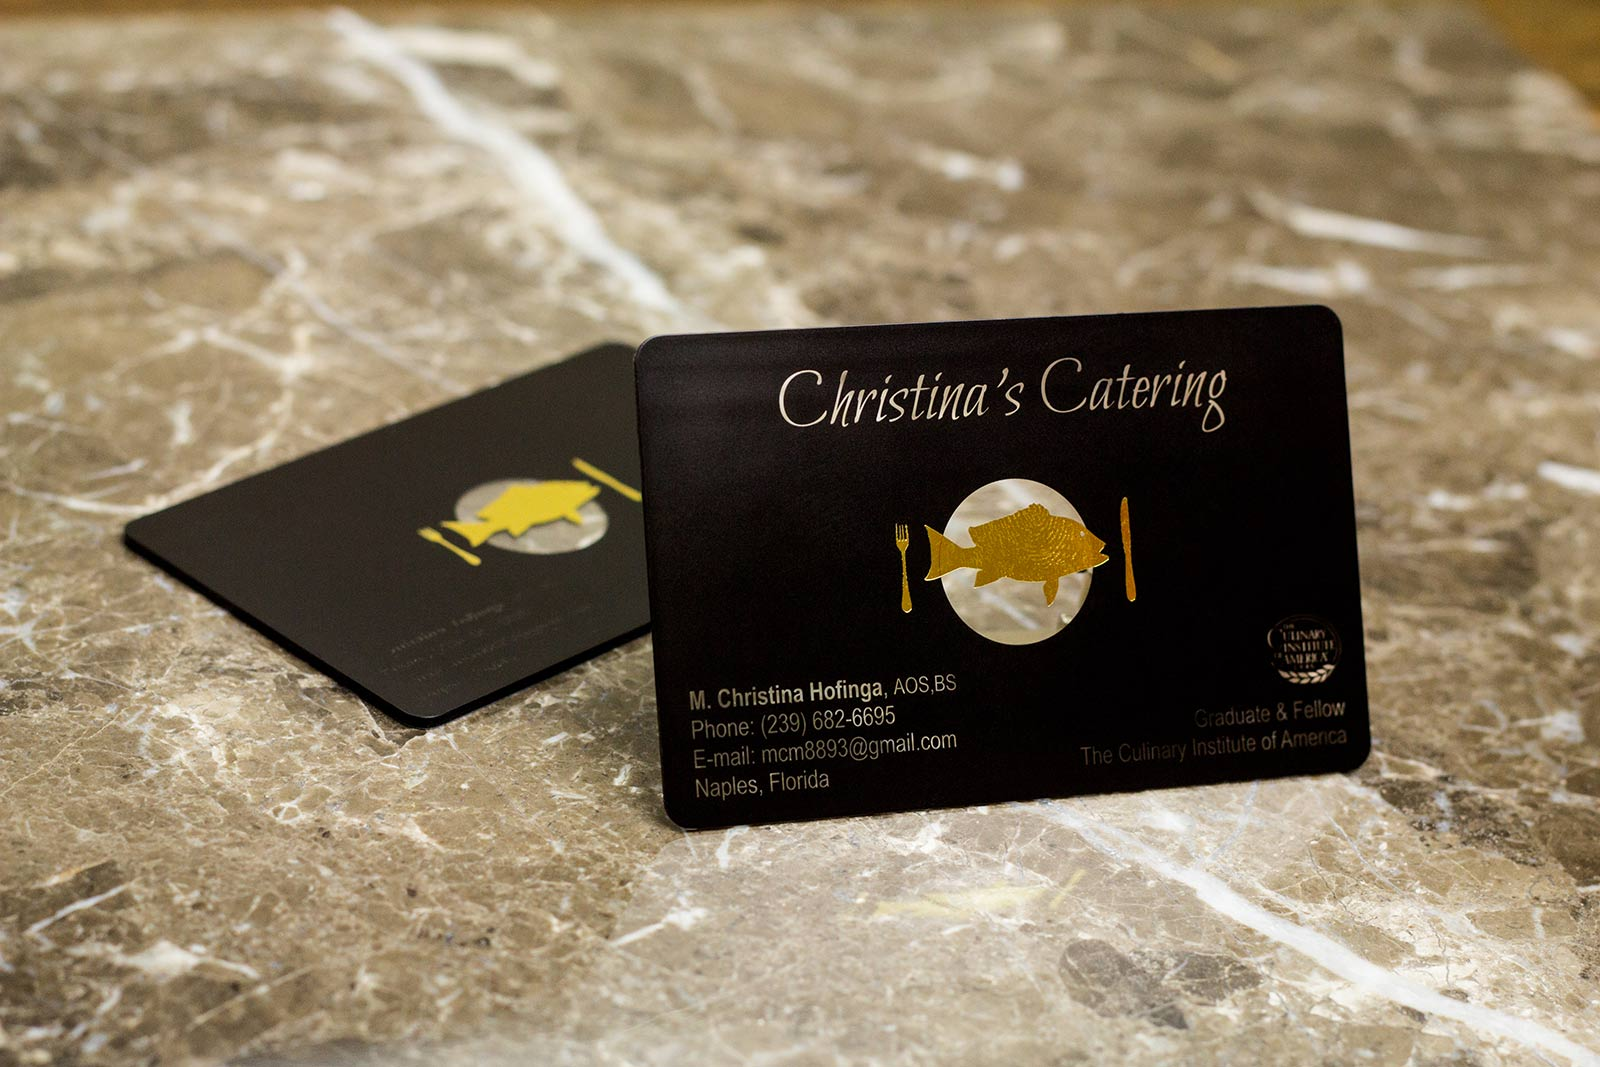 Best Restaurant Business Cards Gallery - Business Card Template